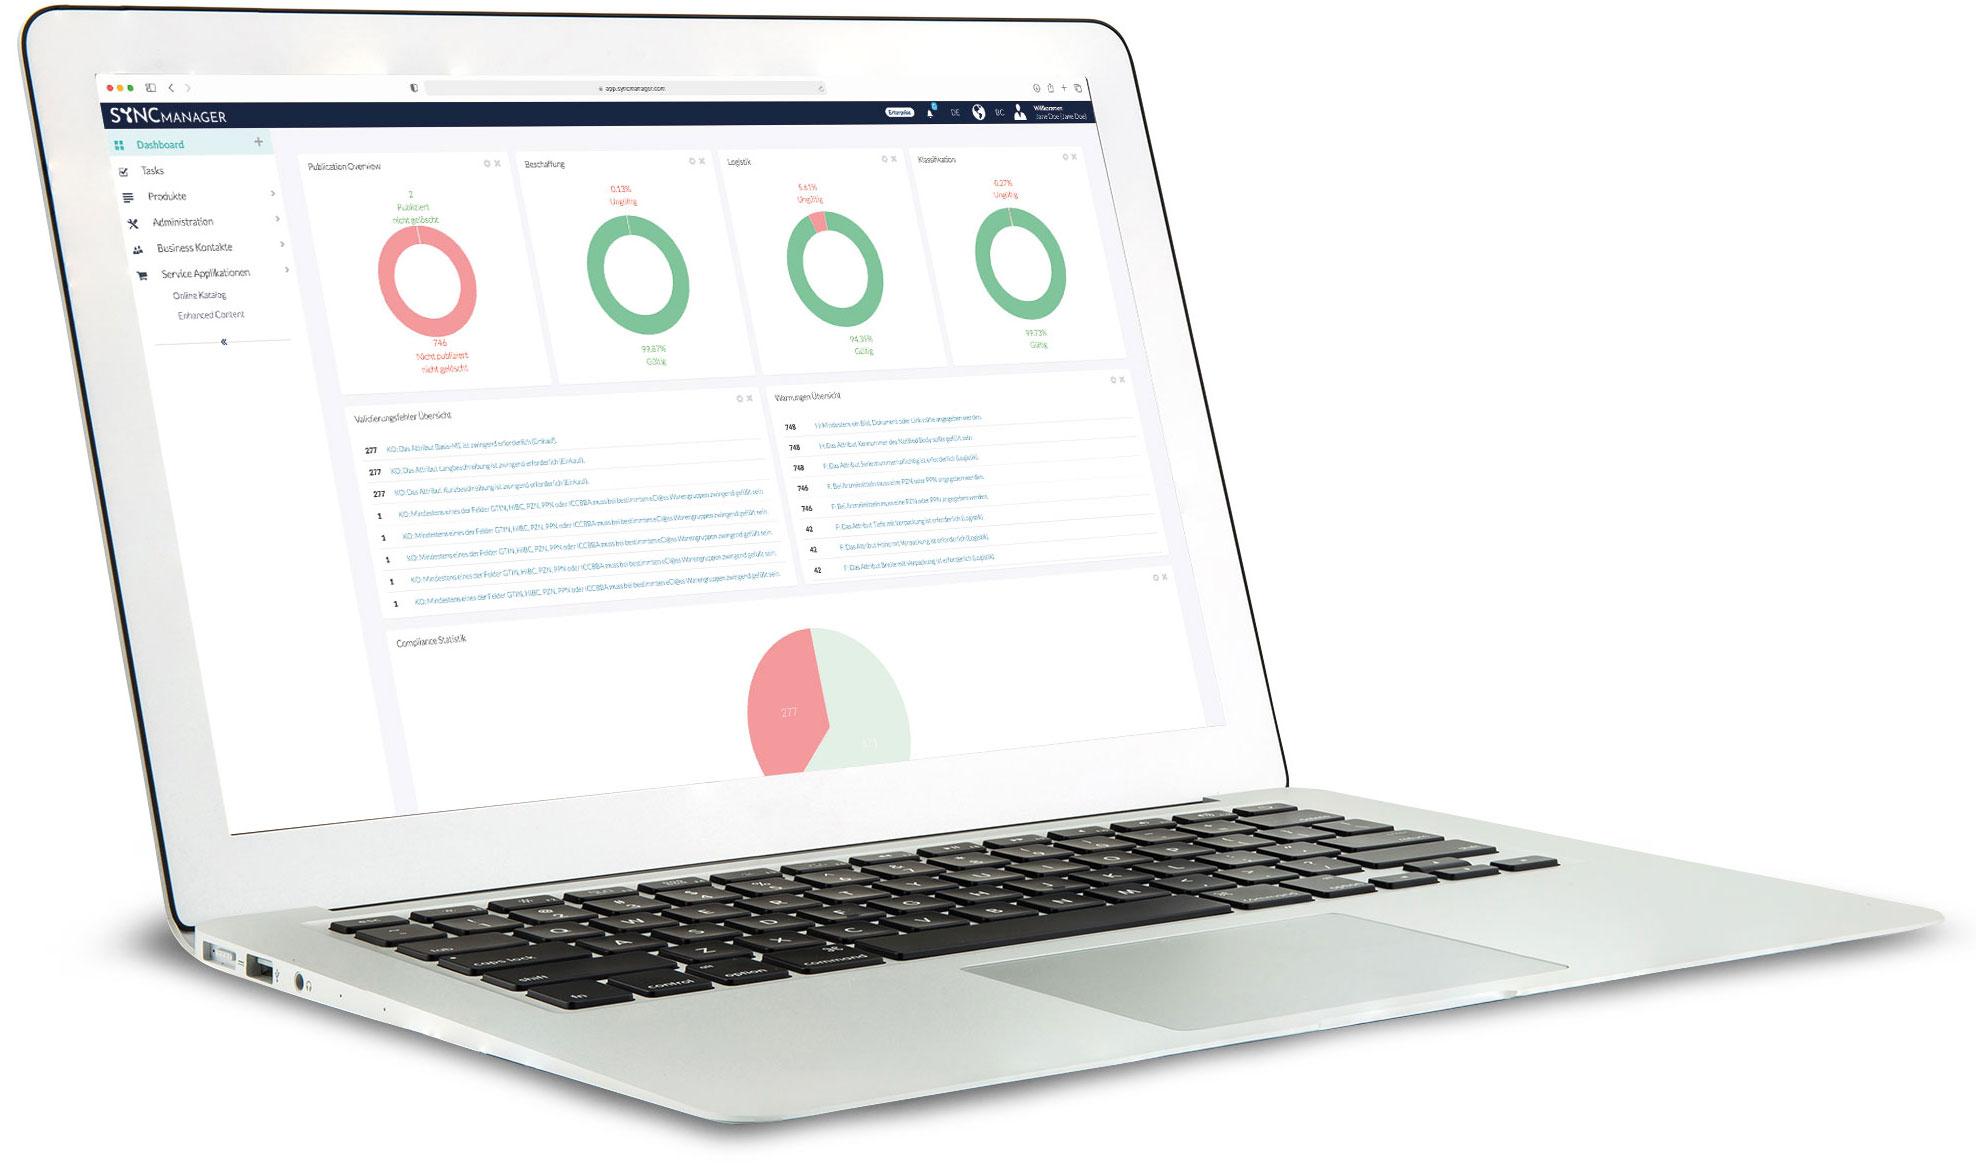 SM_ScreenShots_Dashboard_Laptop